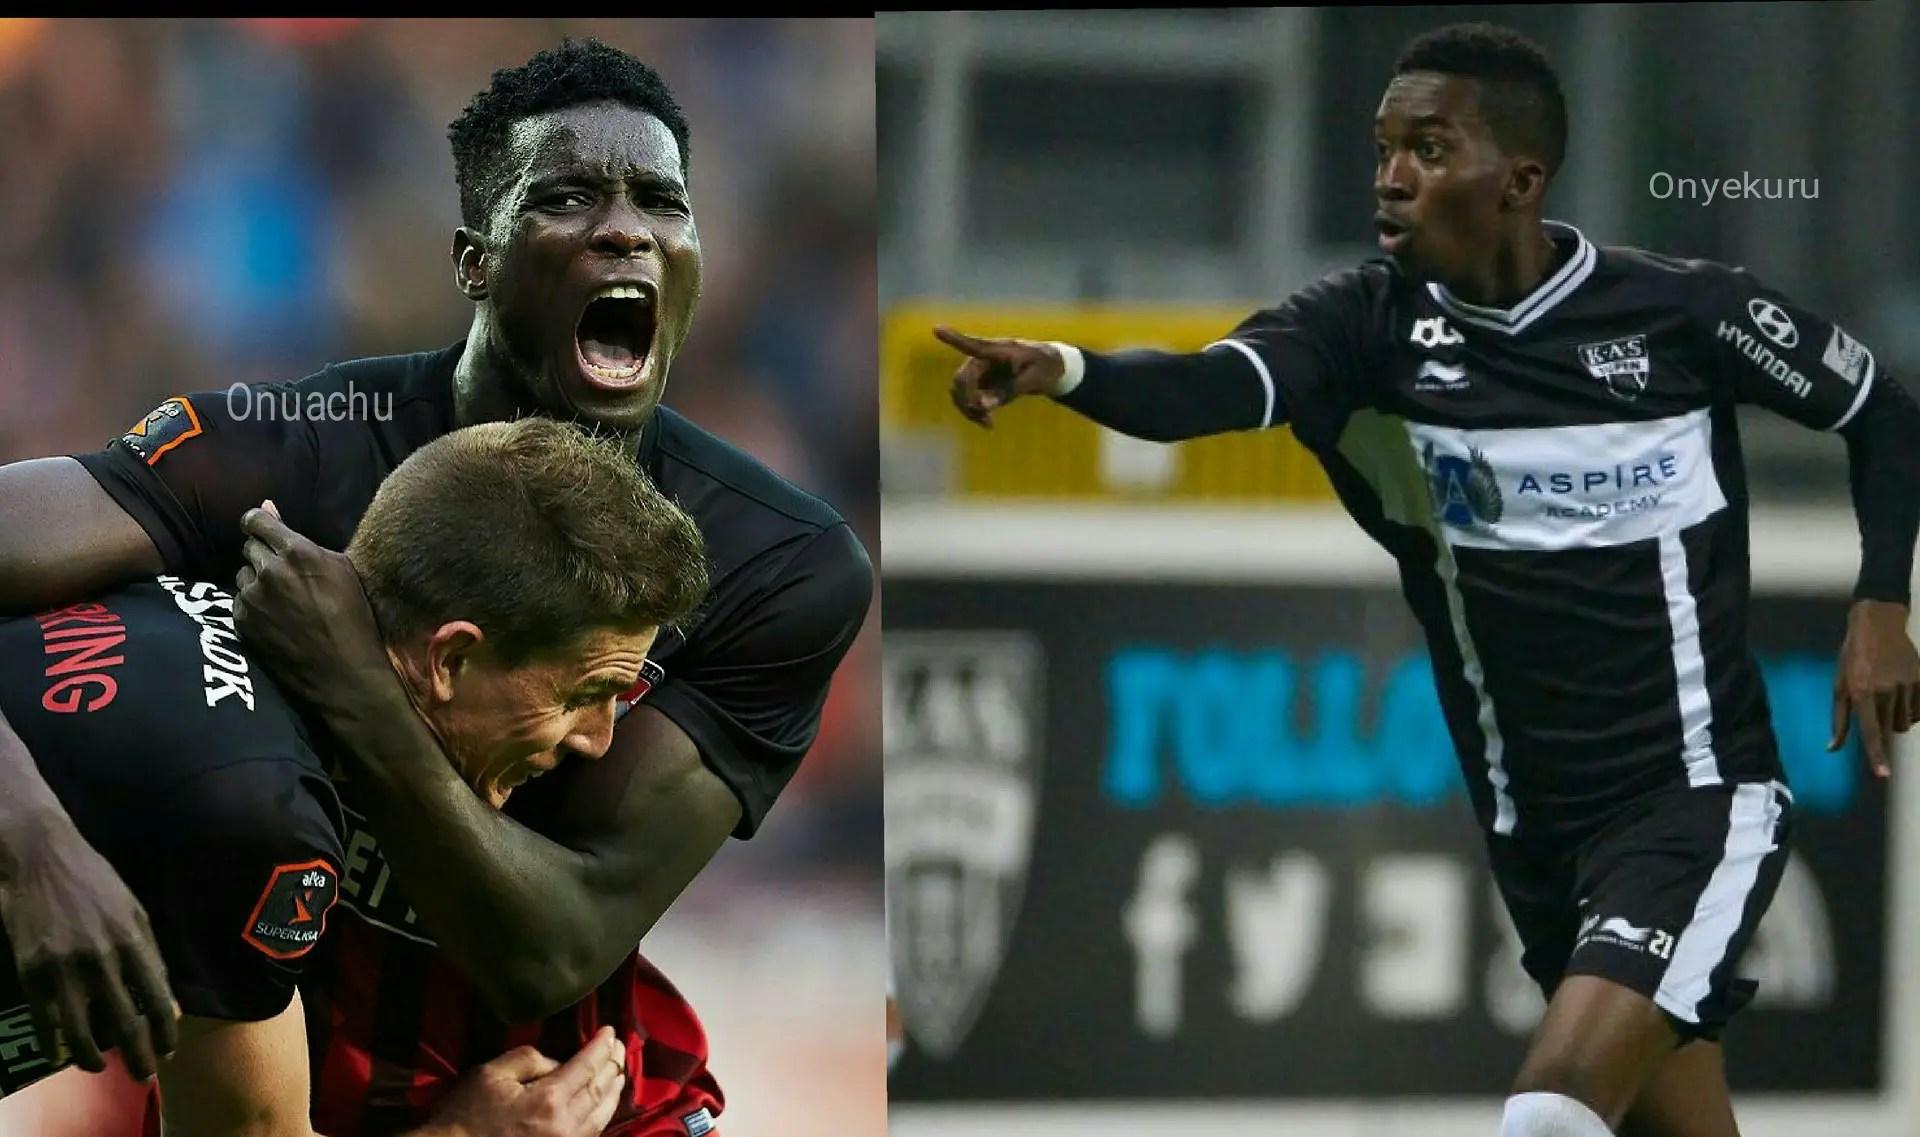 Onyekuru, Onuachu On Target In Belgium, Denmark As Eupen, Midtjylland Win